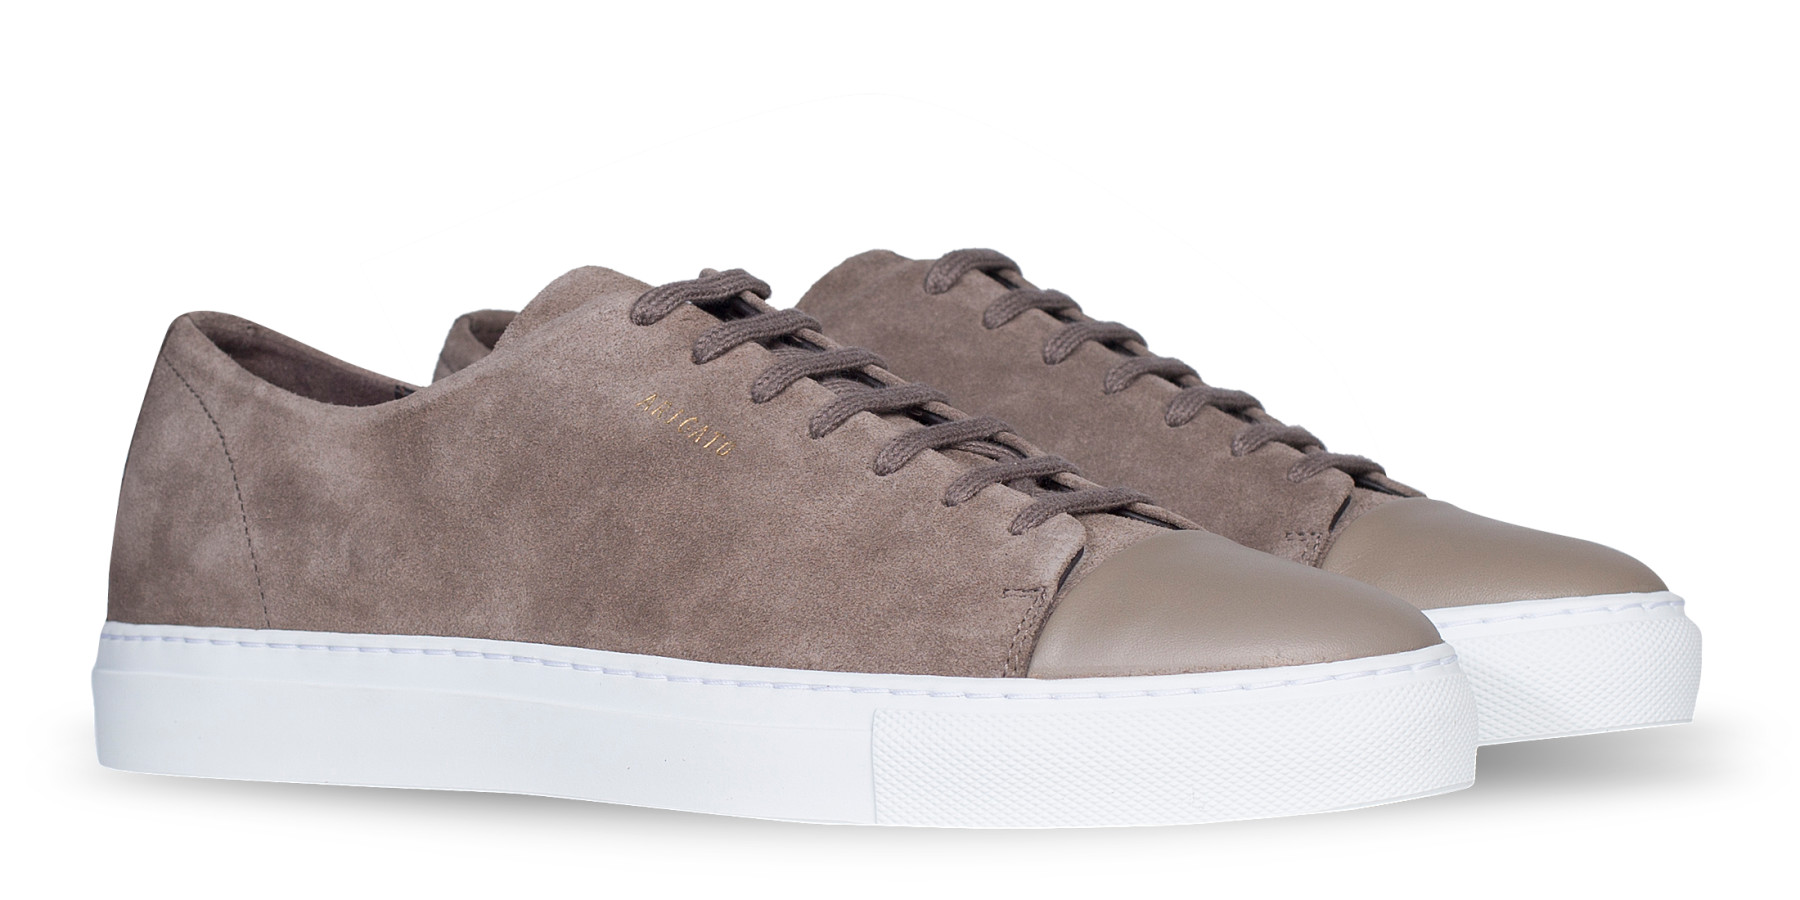 Axel Arigato Captoe Suede Sneakers